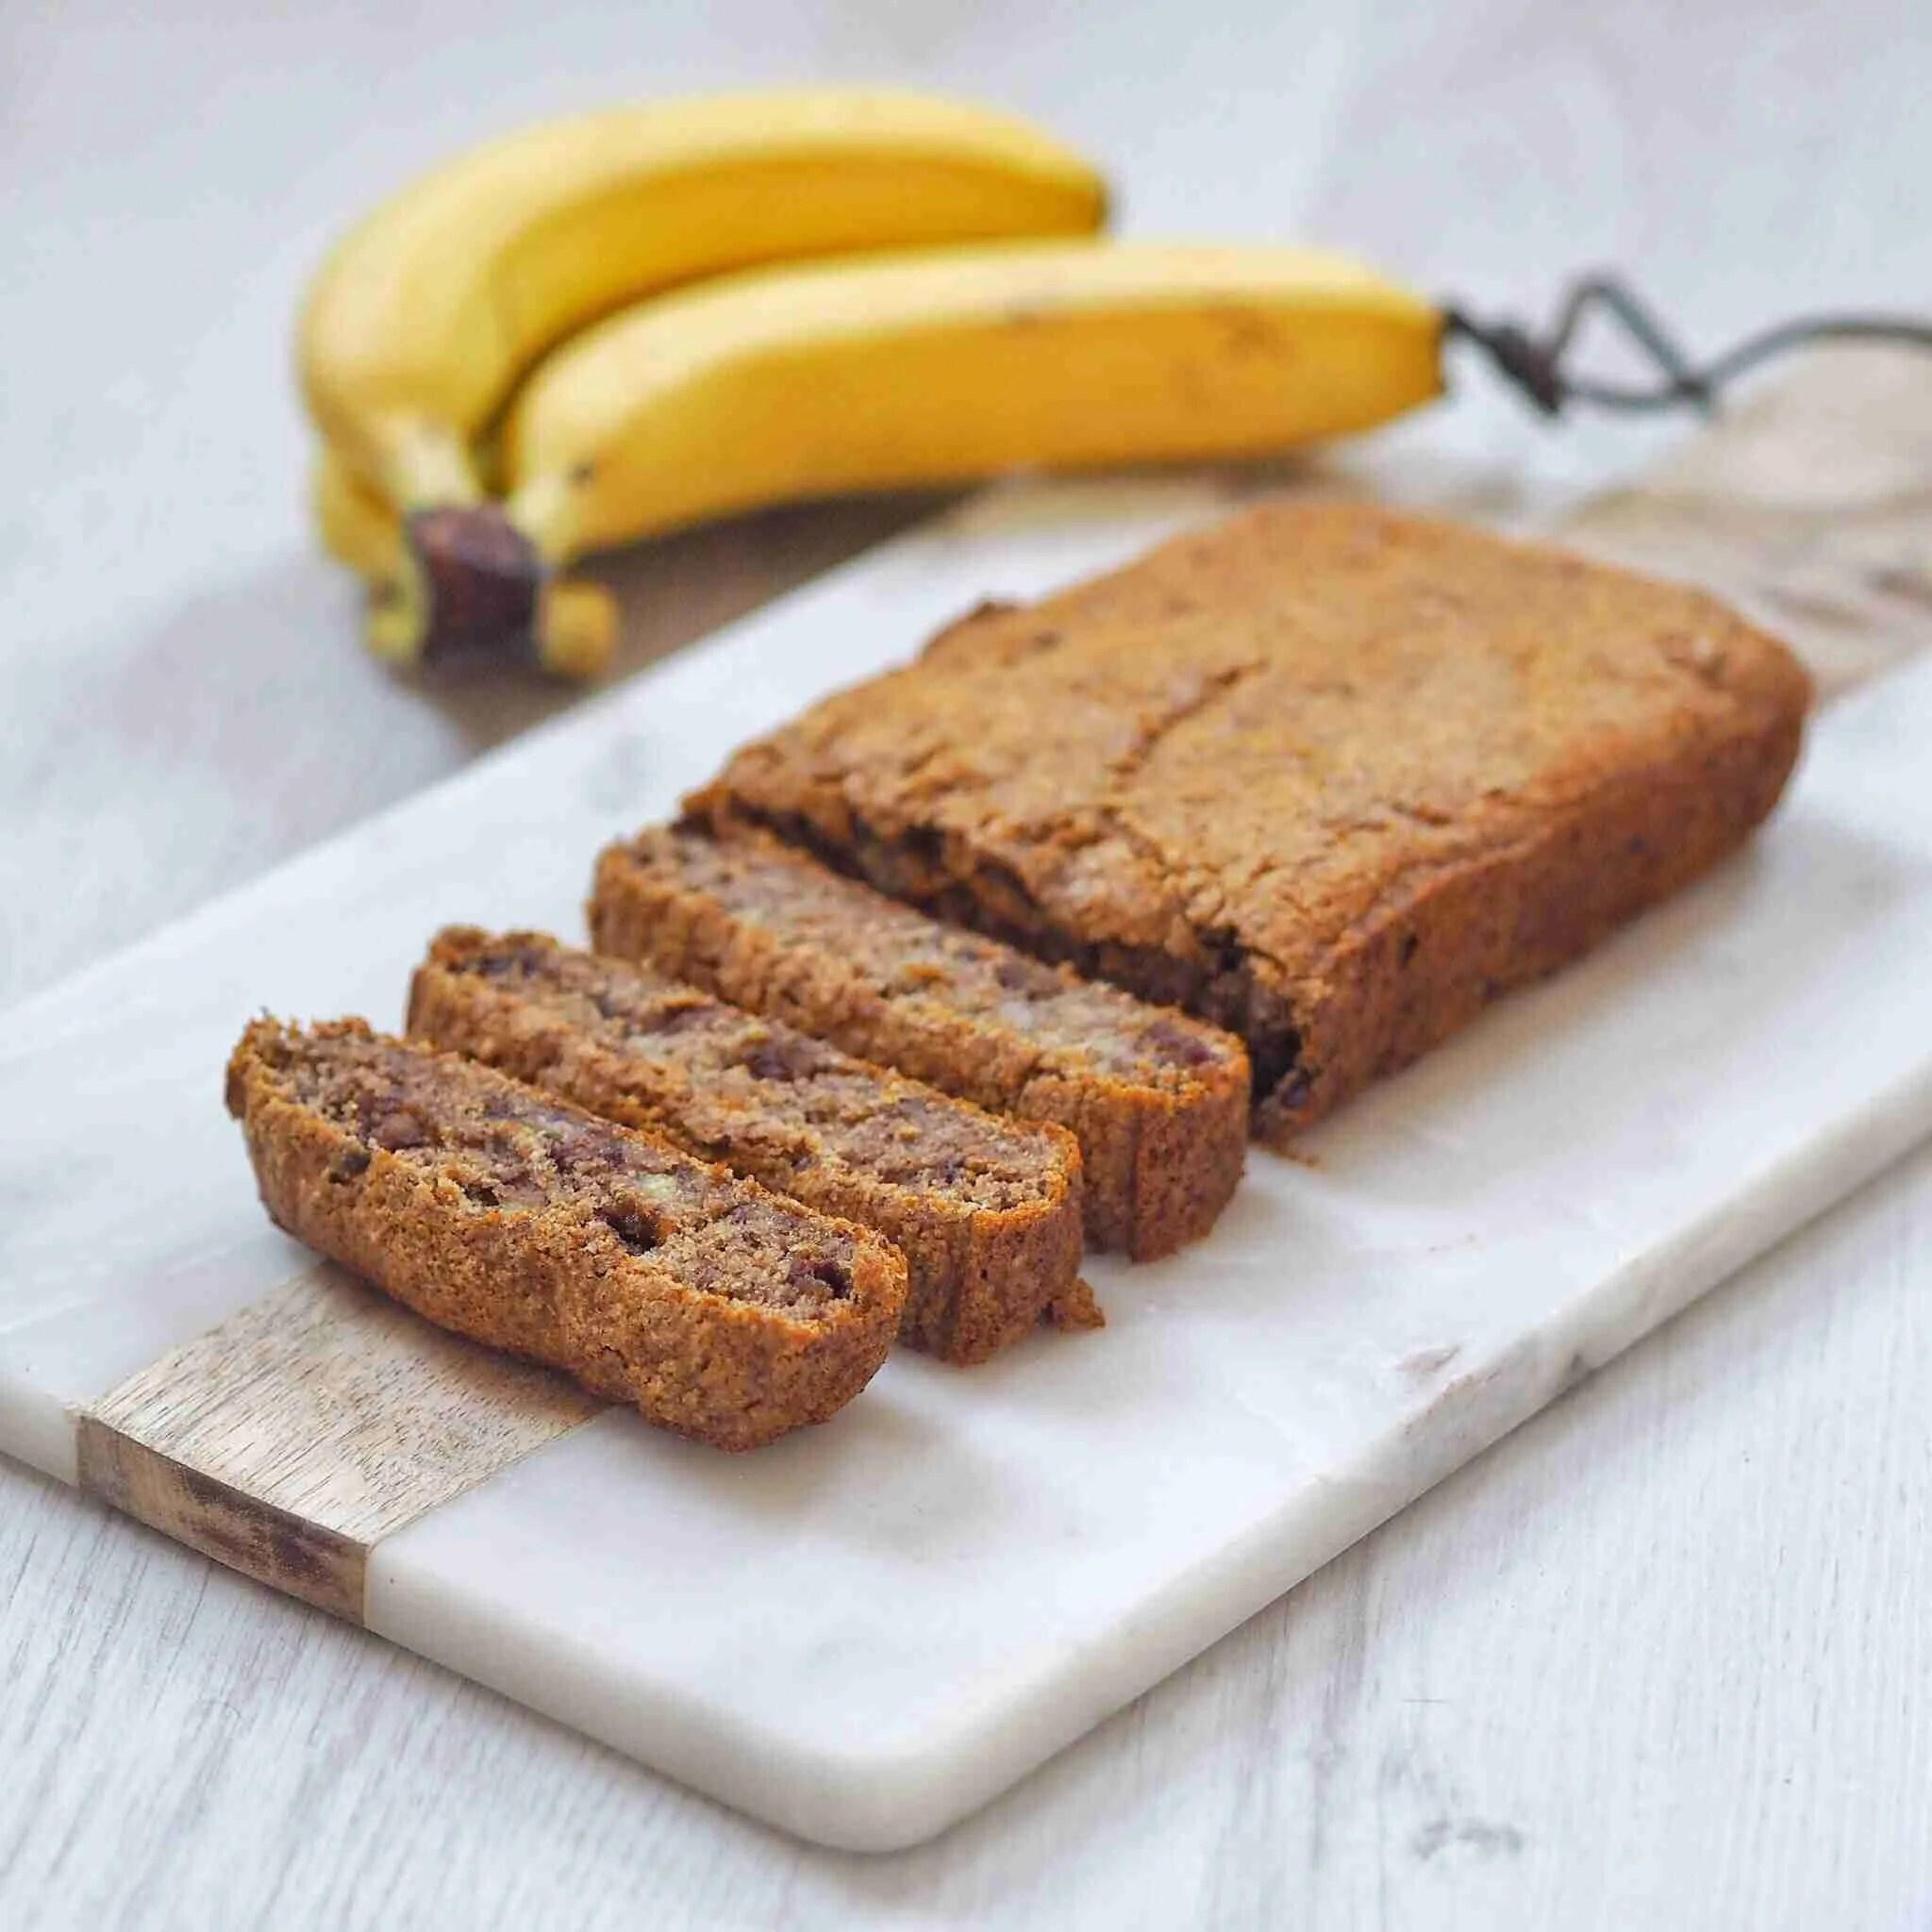 Date and Walnut Vegan Banana Bread